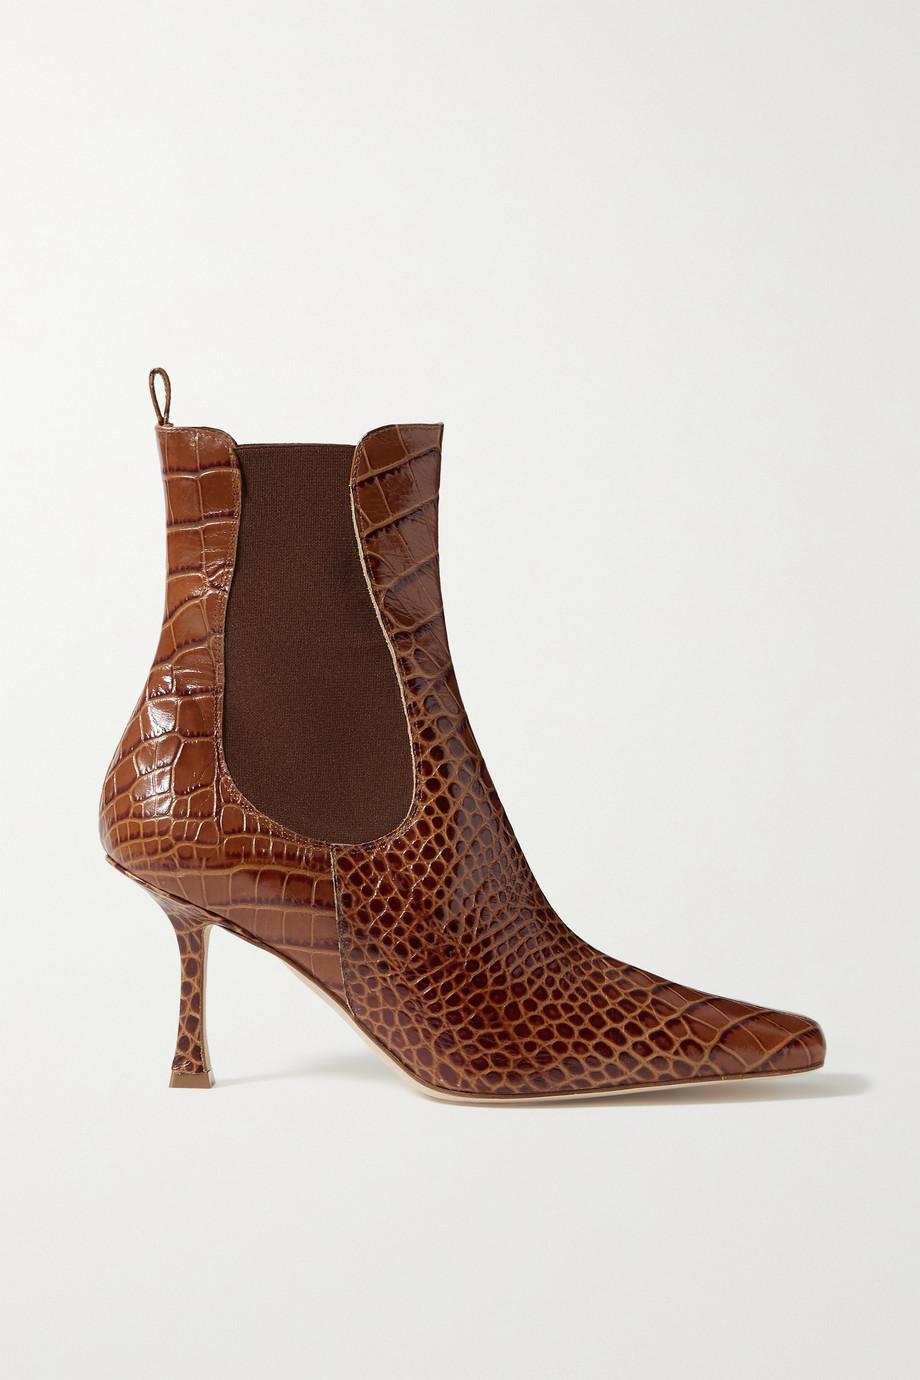 A.W.A.K.E. MODE Chelsea 仿鳄鱼纹皮革踝靴